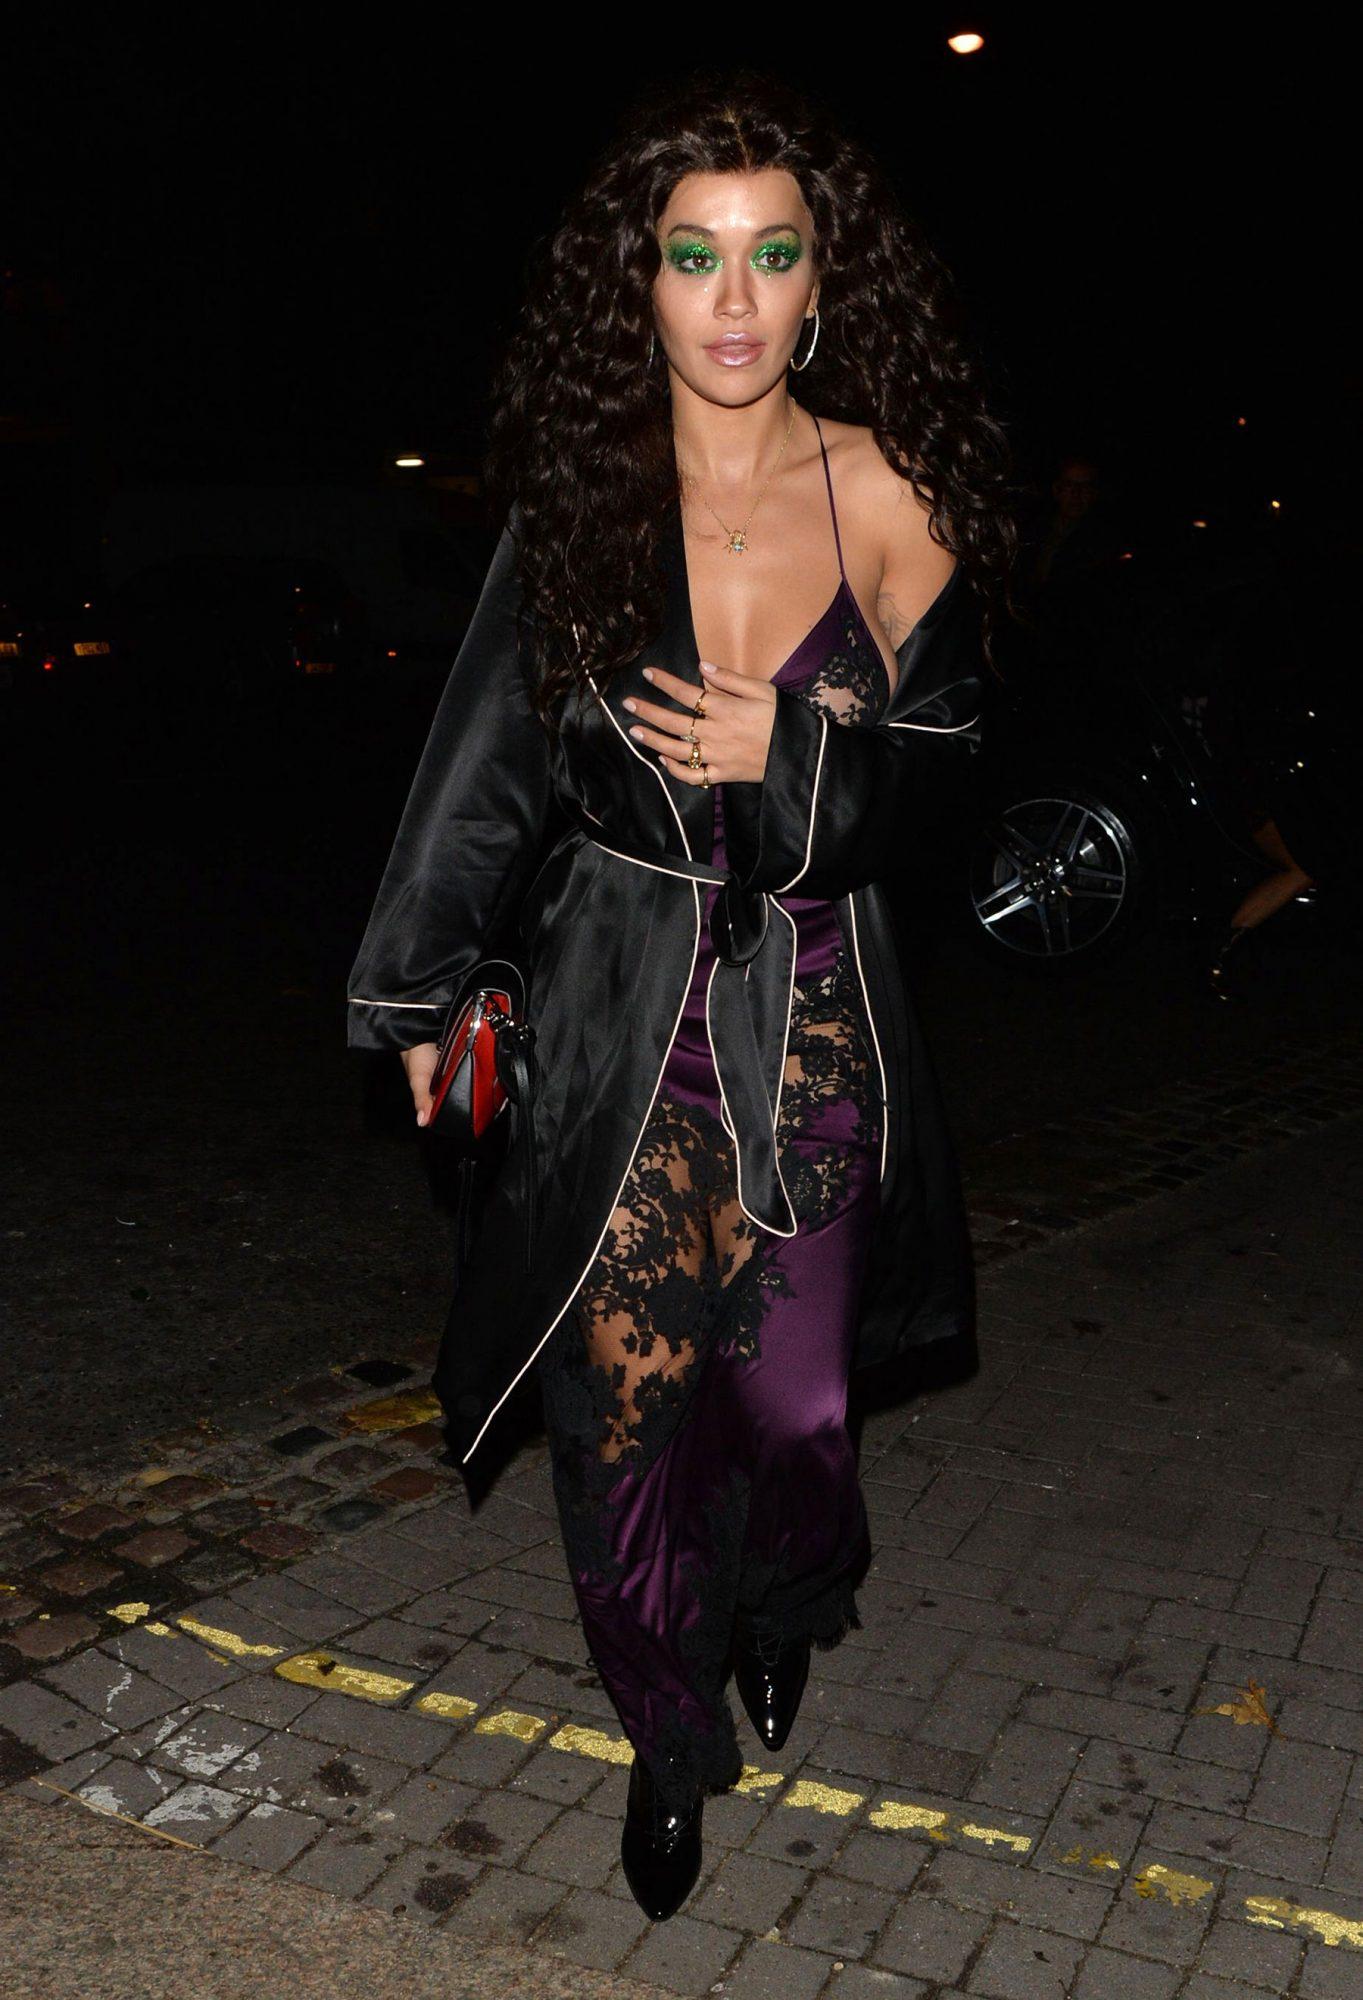 Rita Ora Halloween party, London, UK - 31 Oct 2018